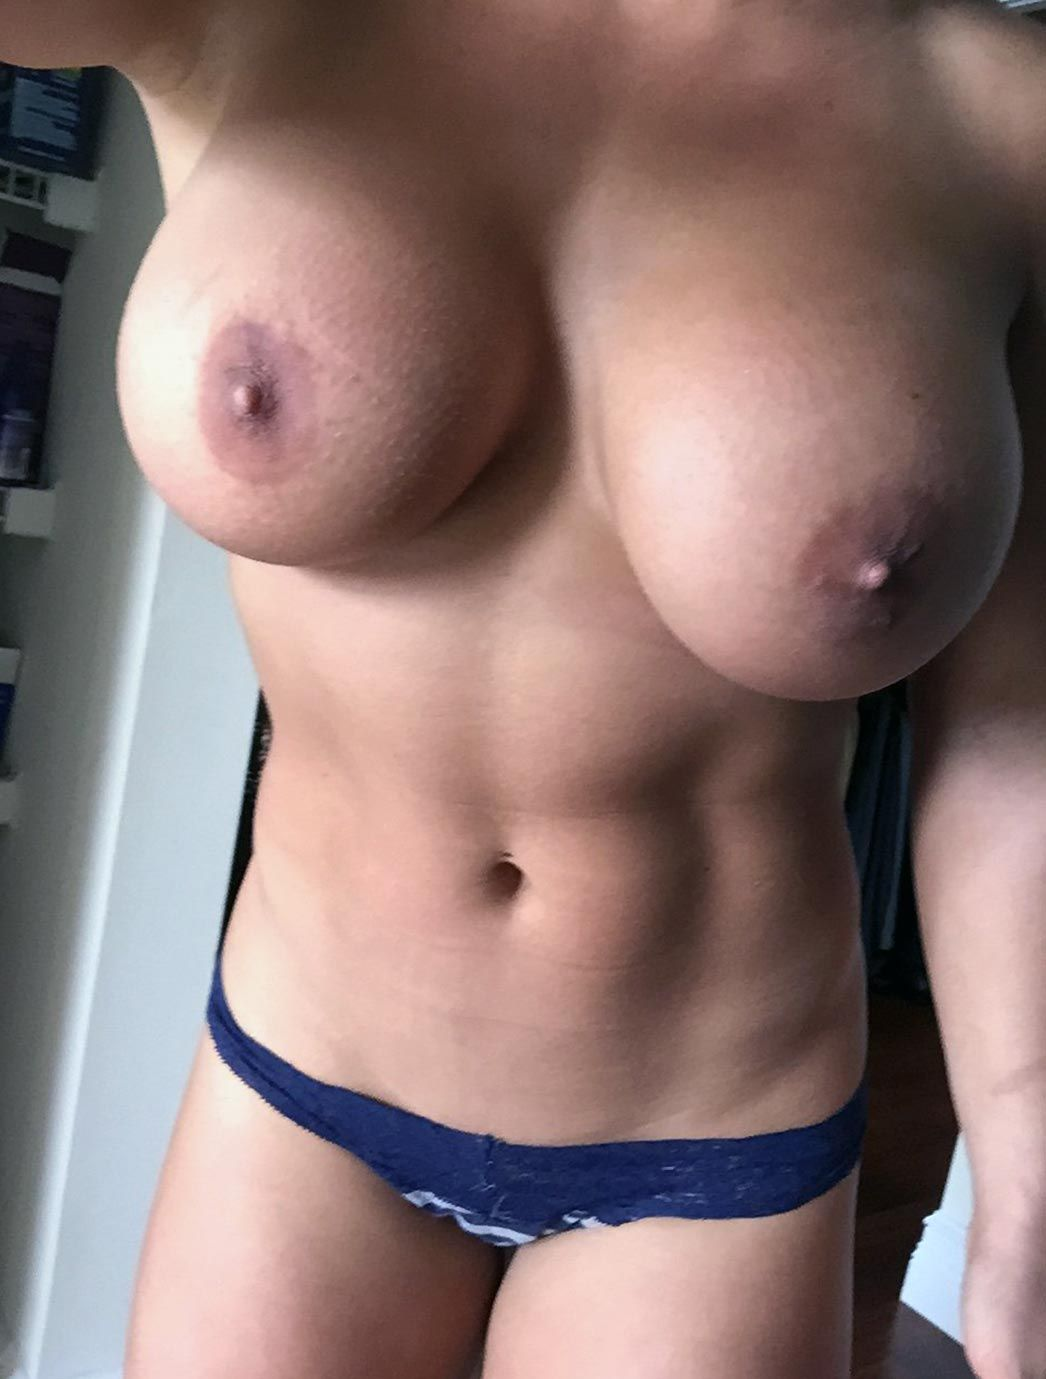 Celeste Bonin Nude Leaked The Fappening & Sexy 0210